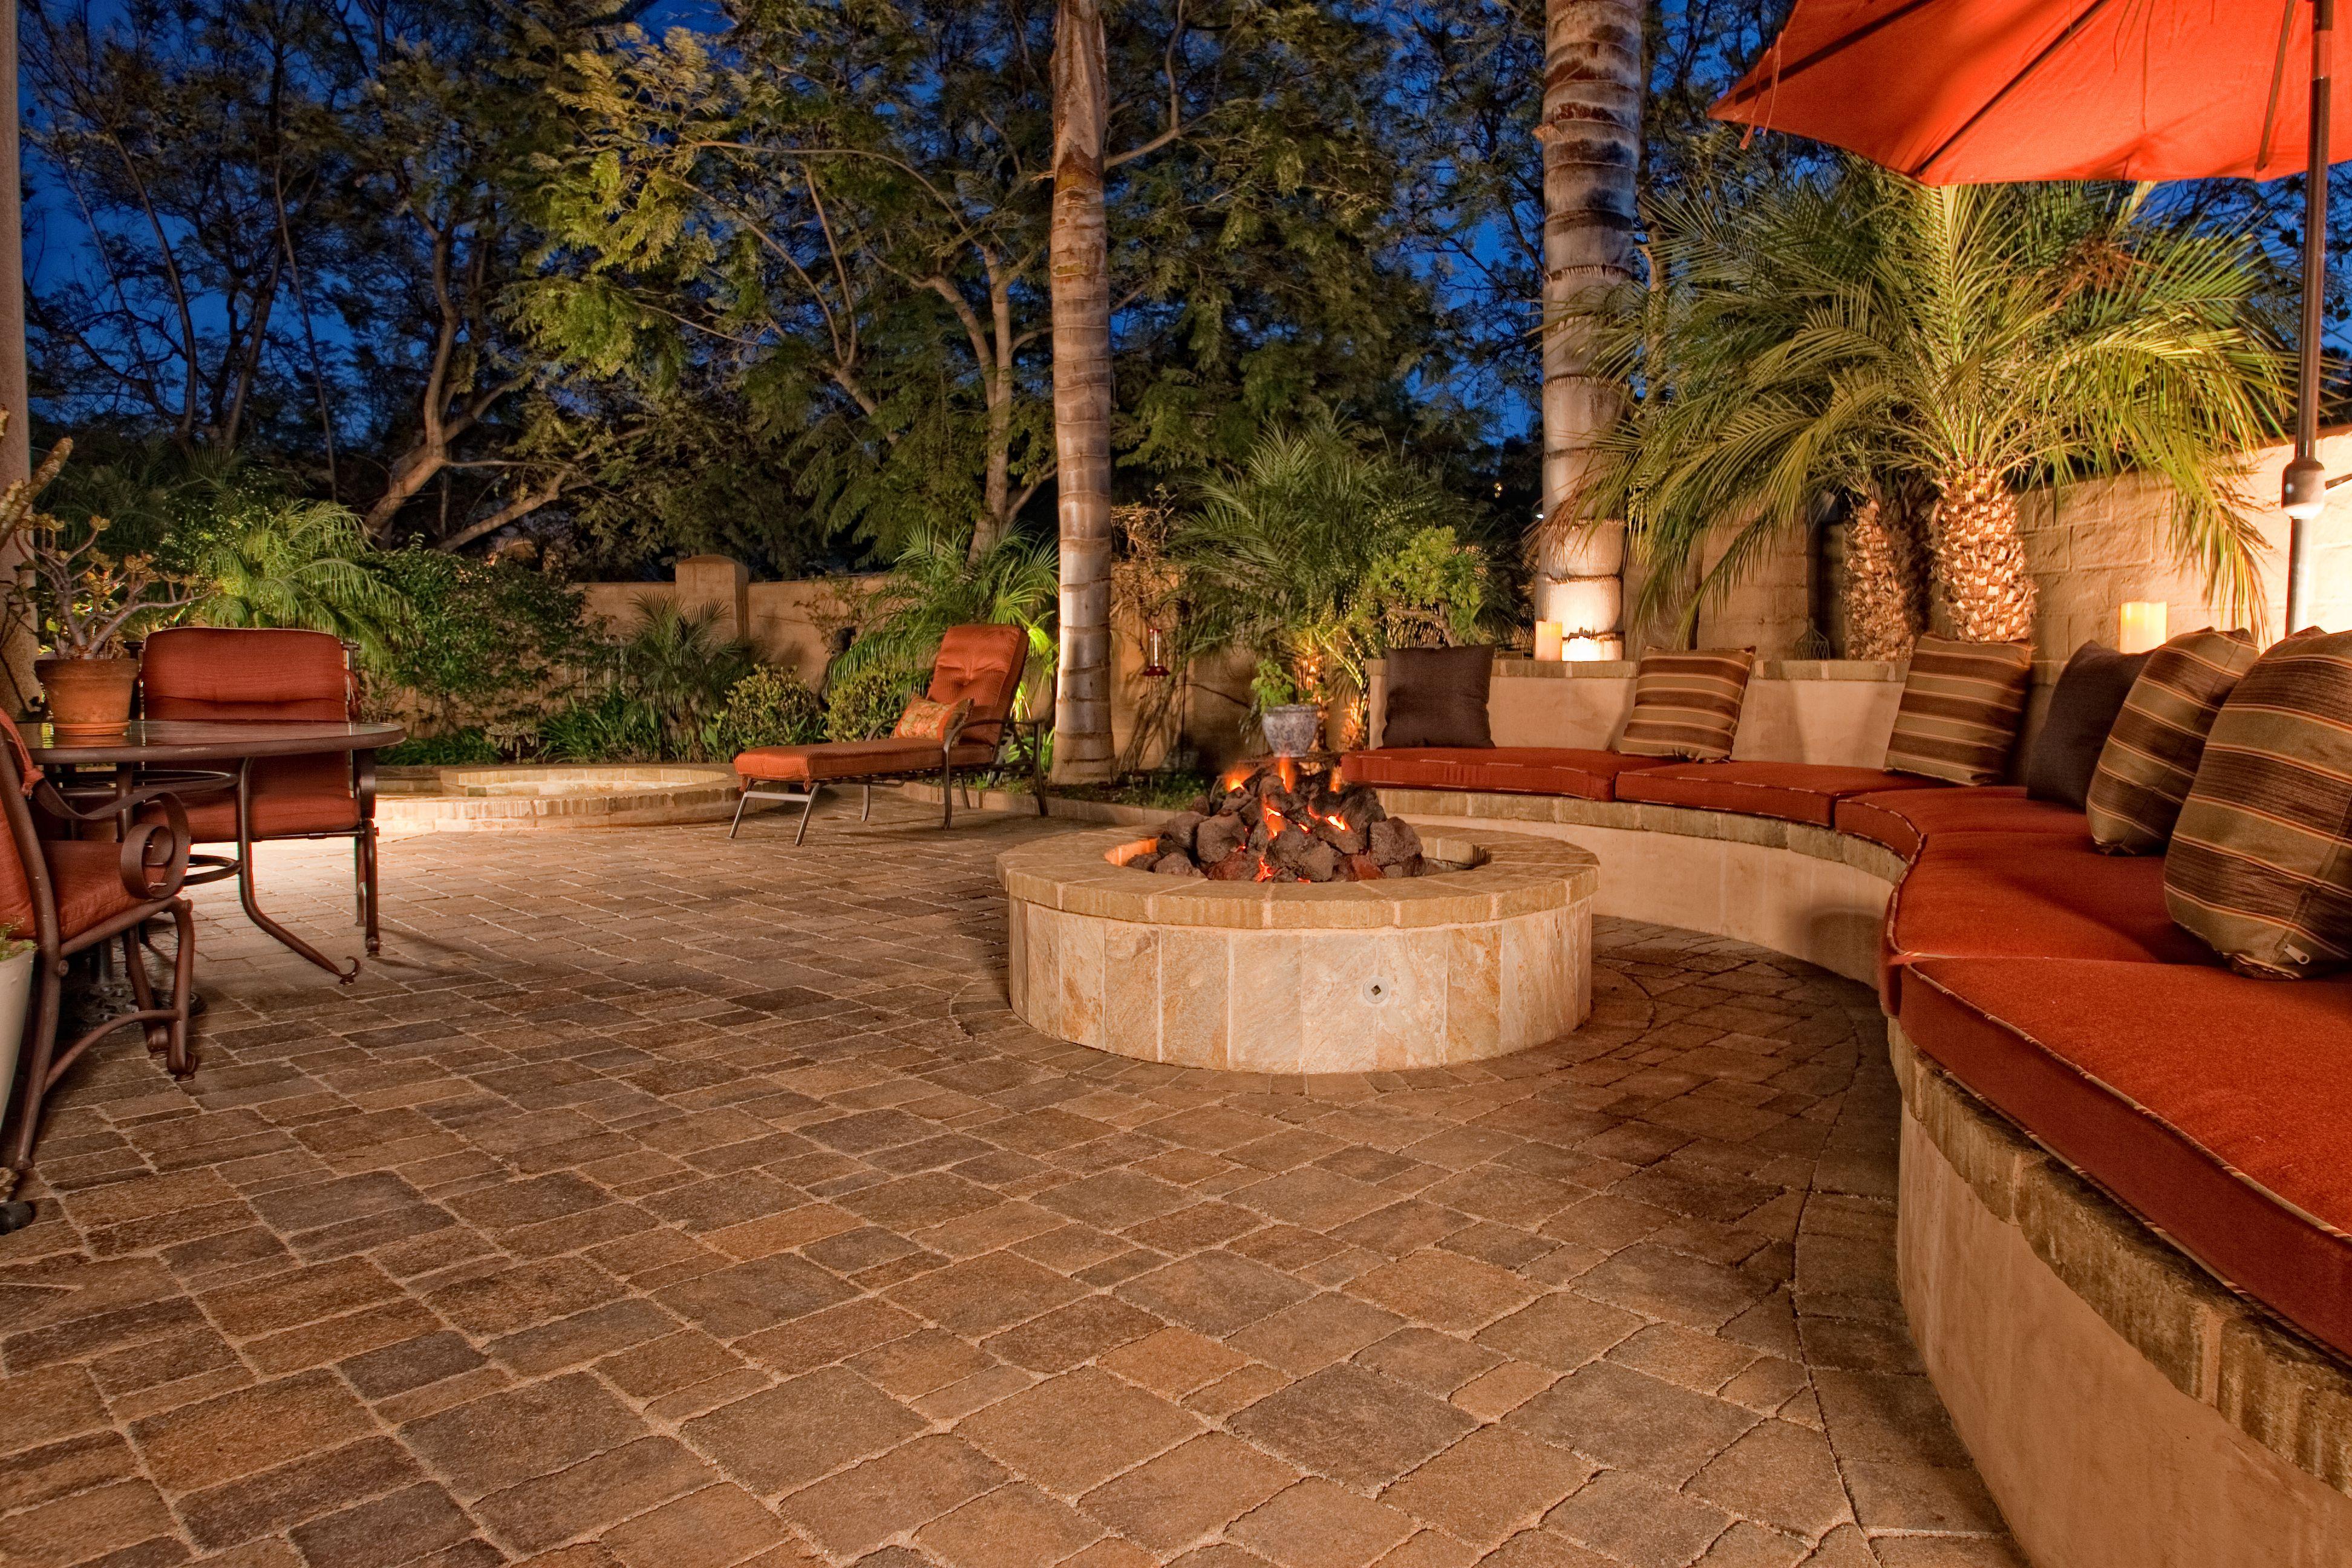 Paver Backyards Pavers Backyard Outdoor Living Design Beautiful Outdoor Living Spaces Beautiful outdoor living spaces